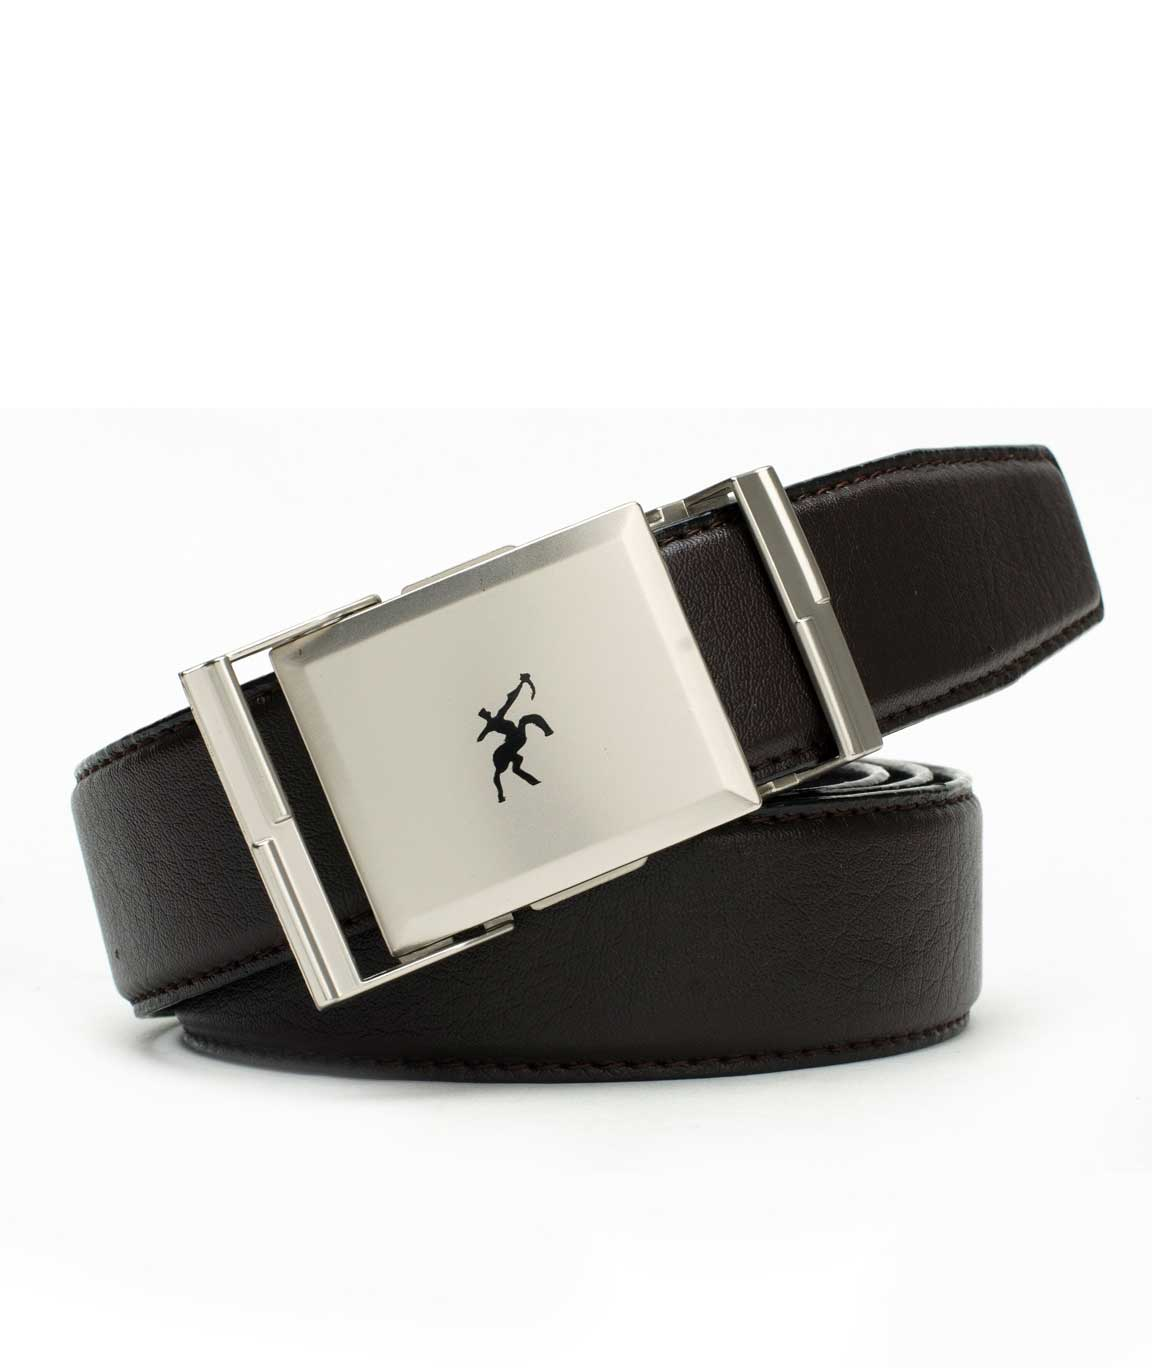 Winsome Deal Brown Leather Formal Belt For Men`s